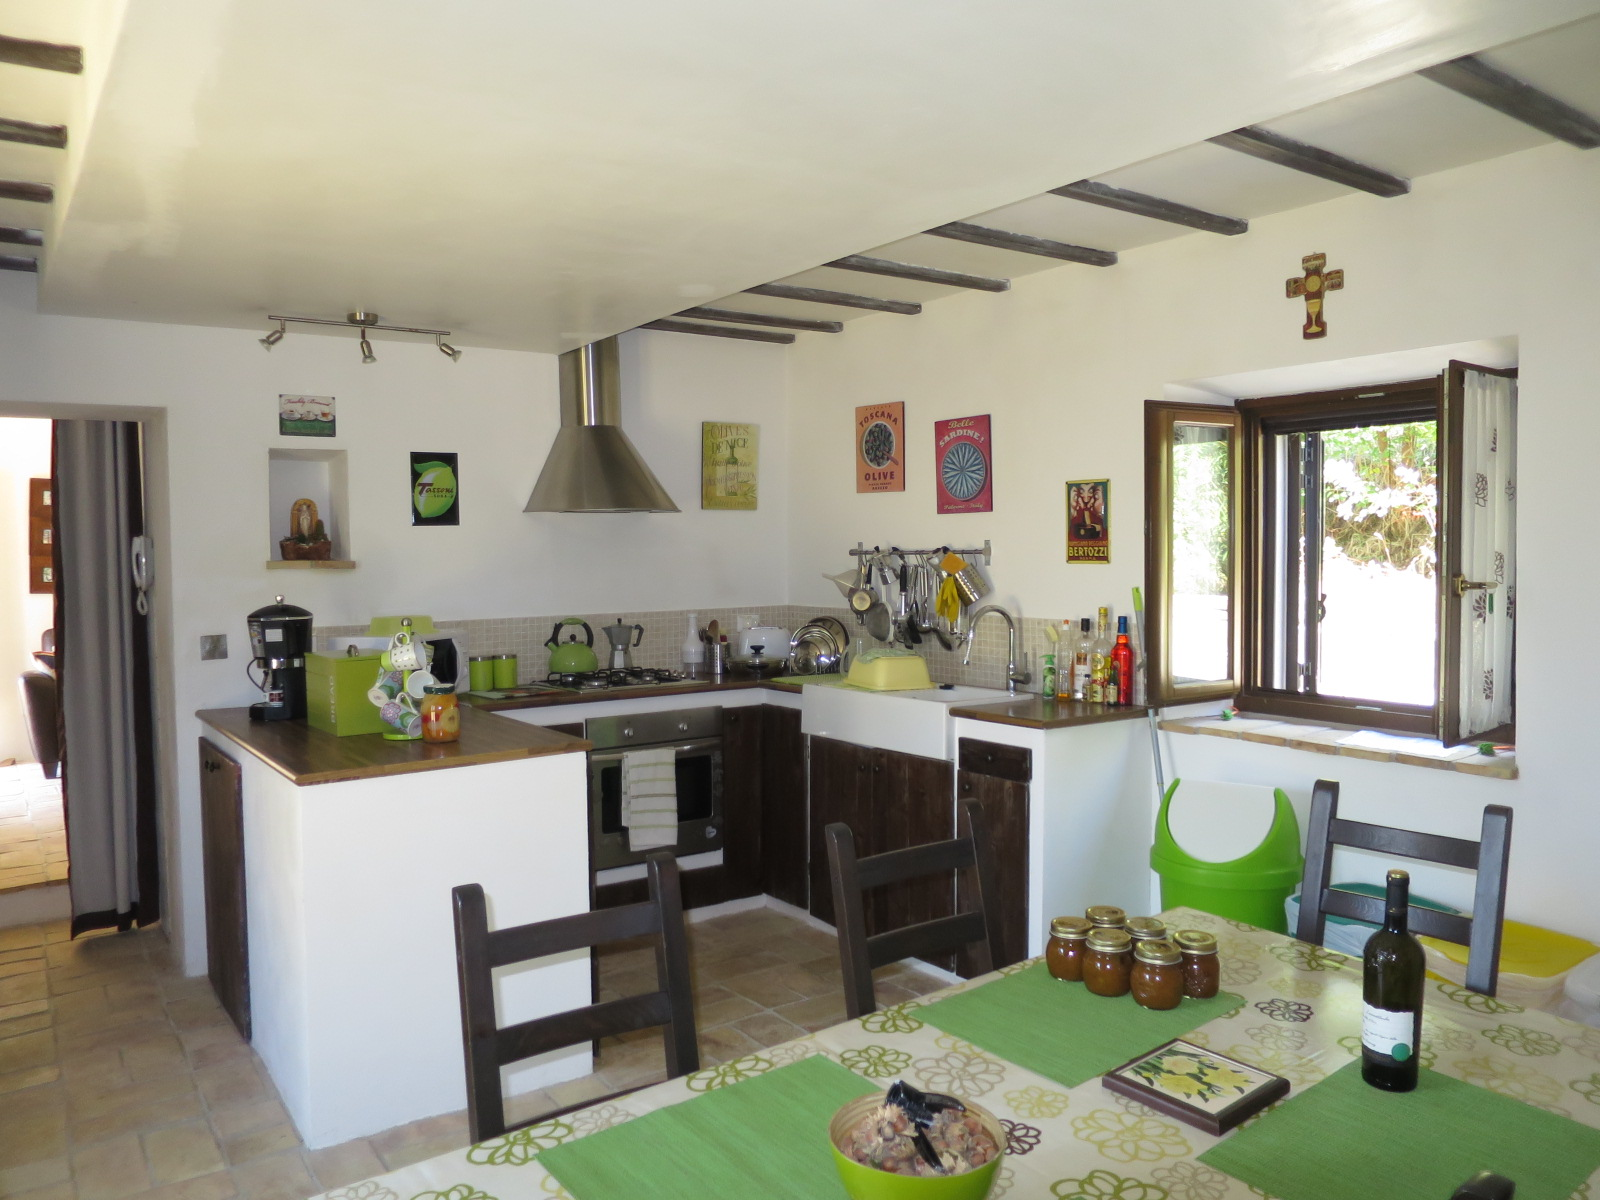 Country Houses Country Houses for sale Montefino (TE), Casa Collina - Montefino - EUR 159.972 290